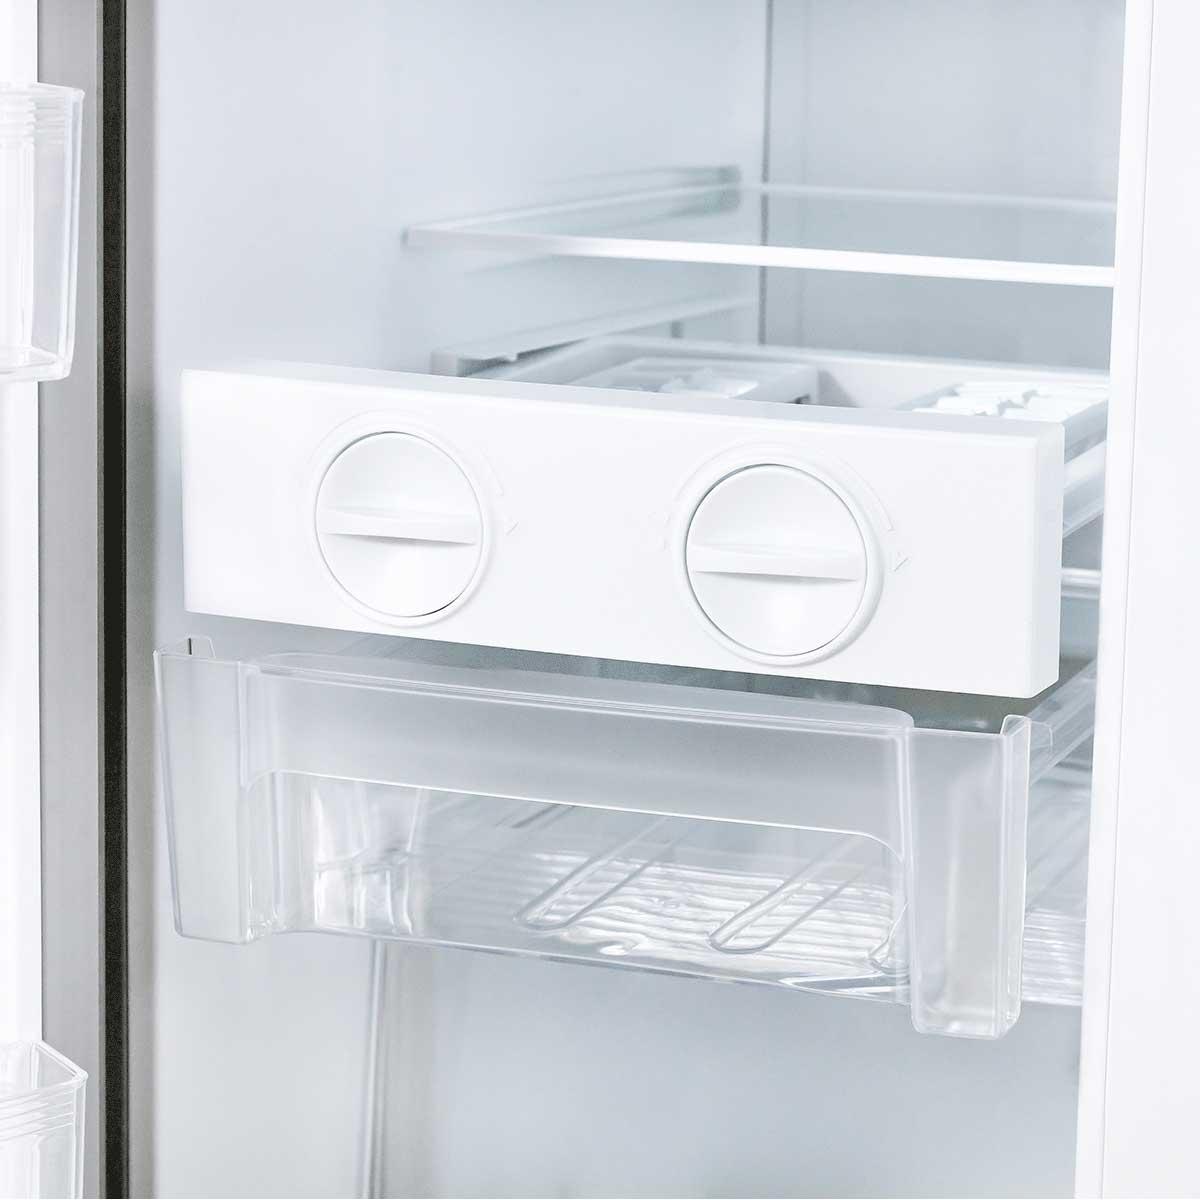 Refrigerator SBS 689 IXF